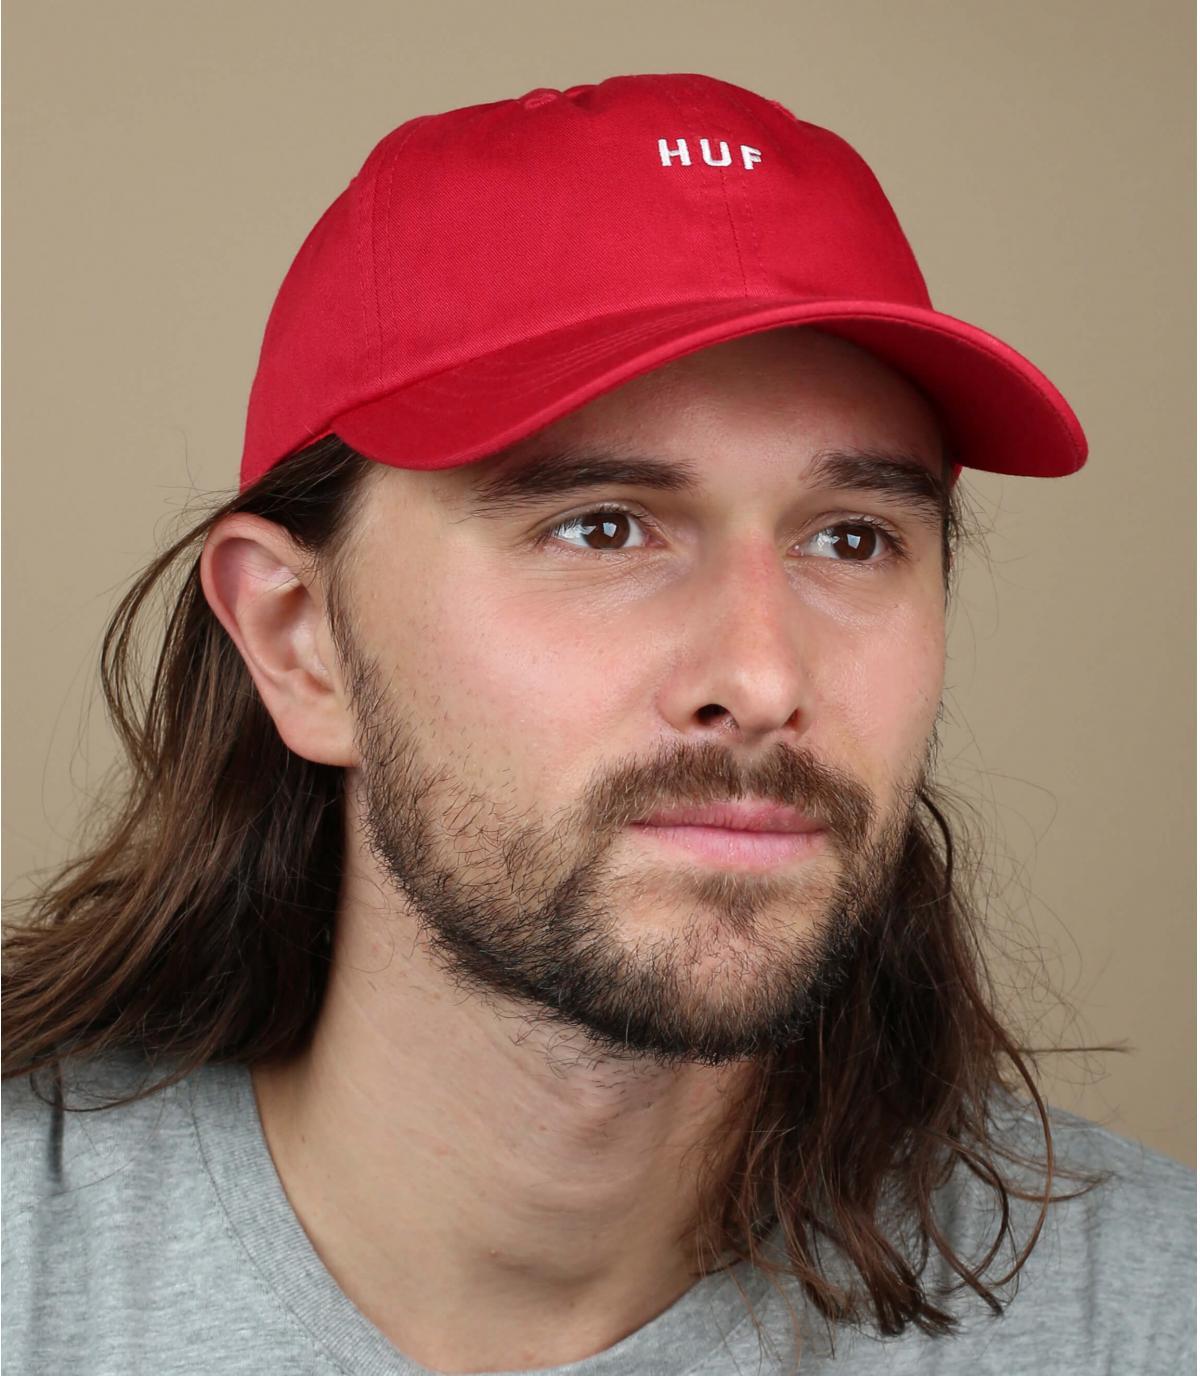 gorra Huf rojo